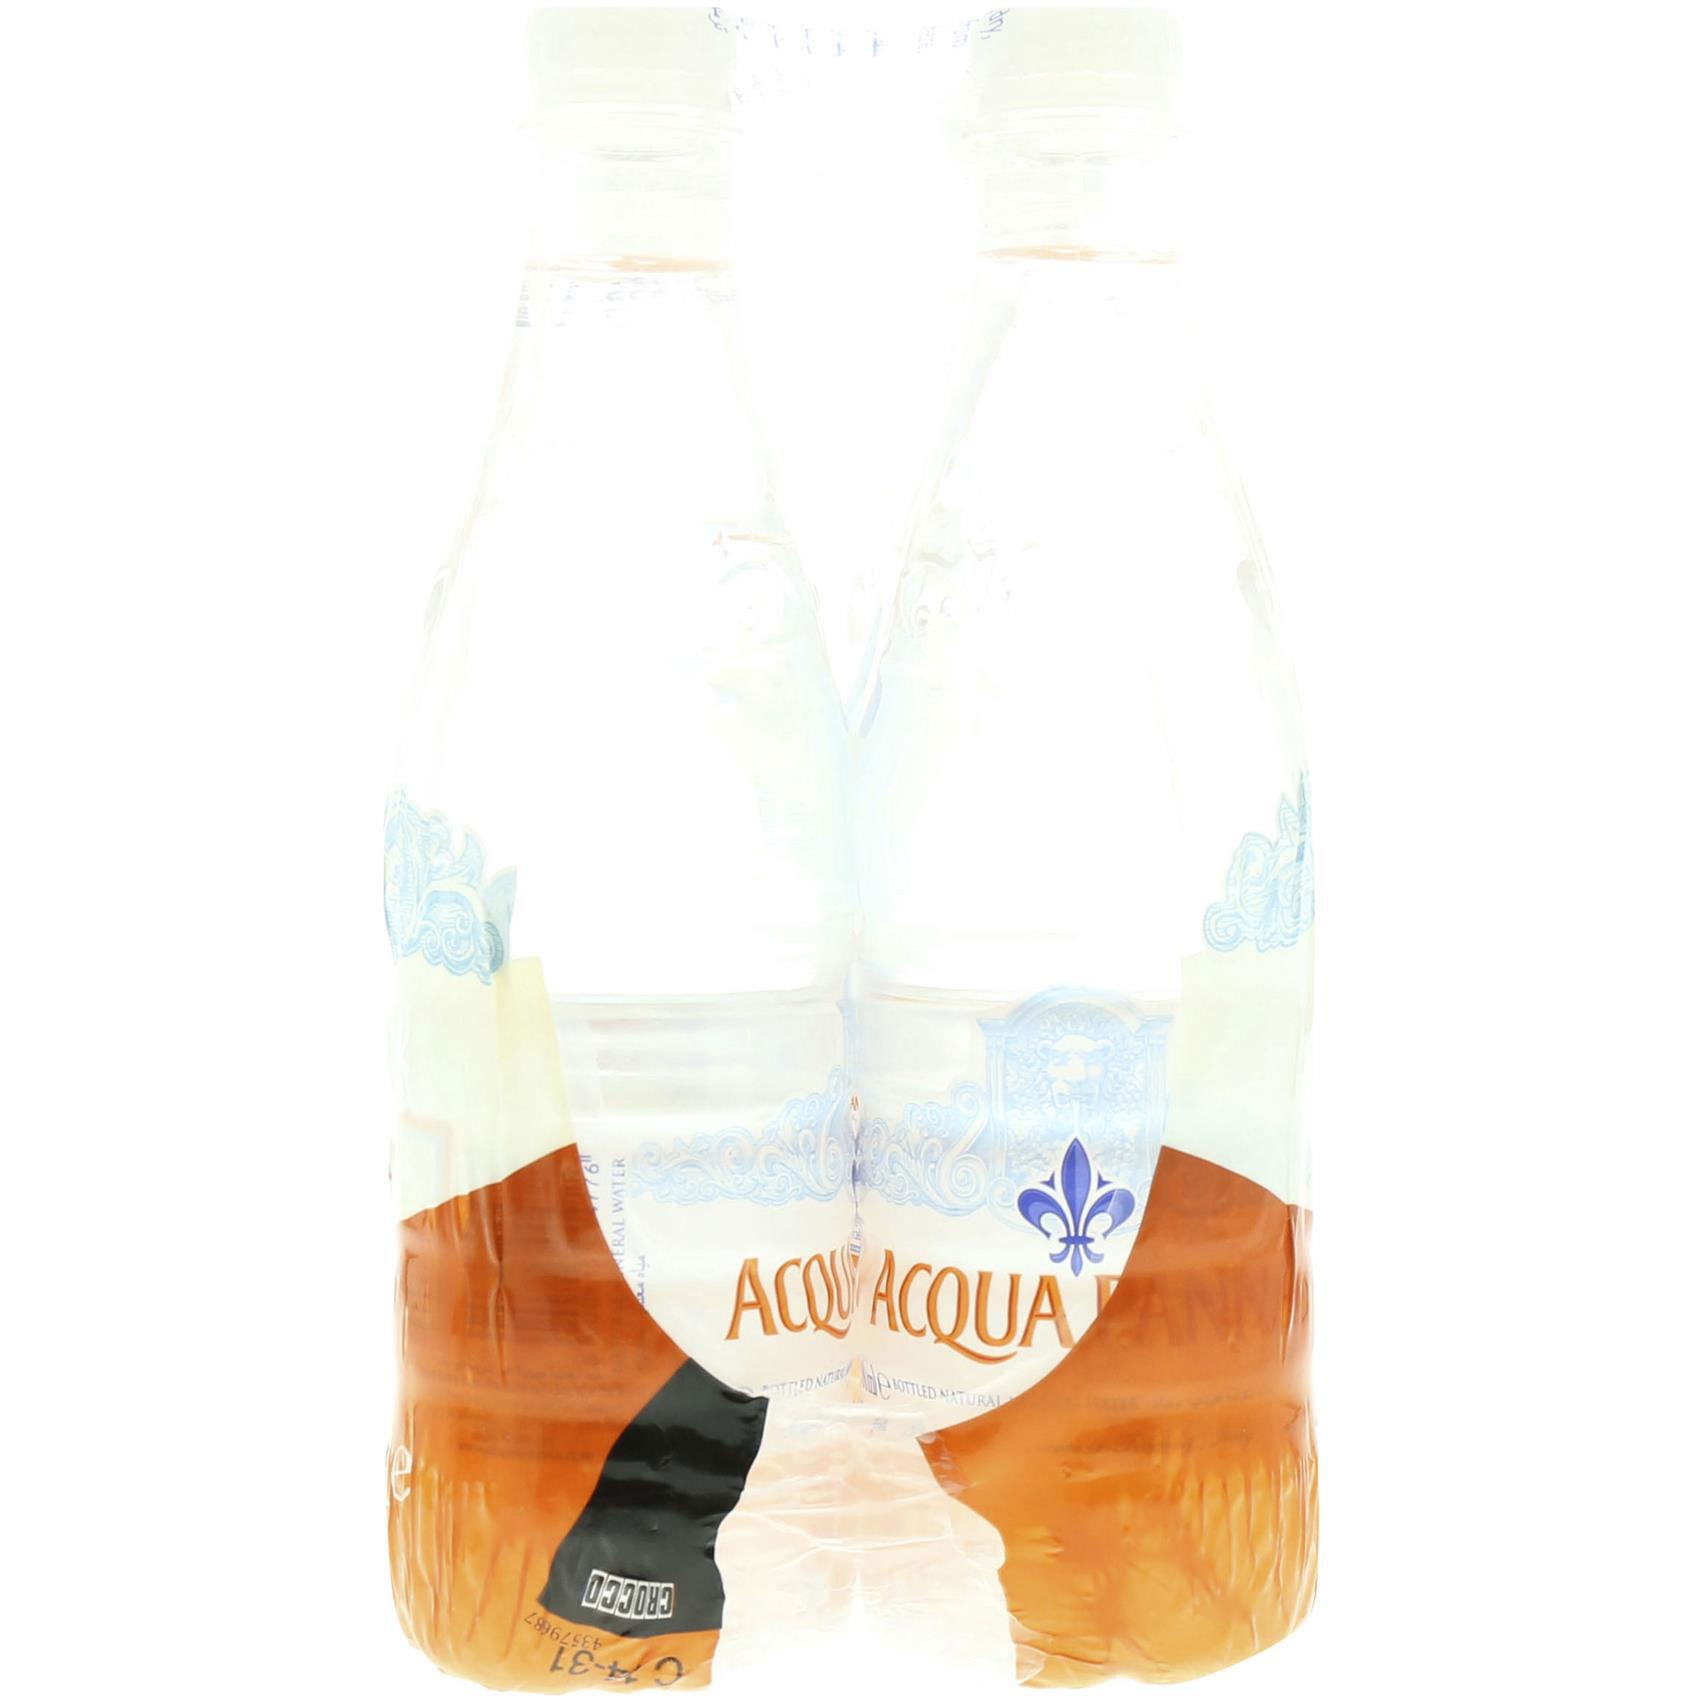 A. PANNA NAT.MINERAL WATER 500MLX6